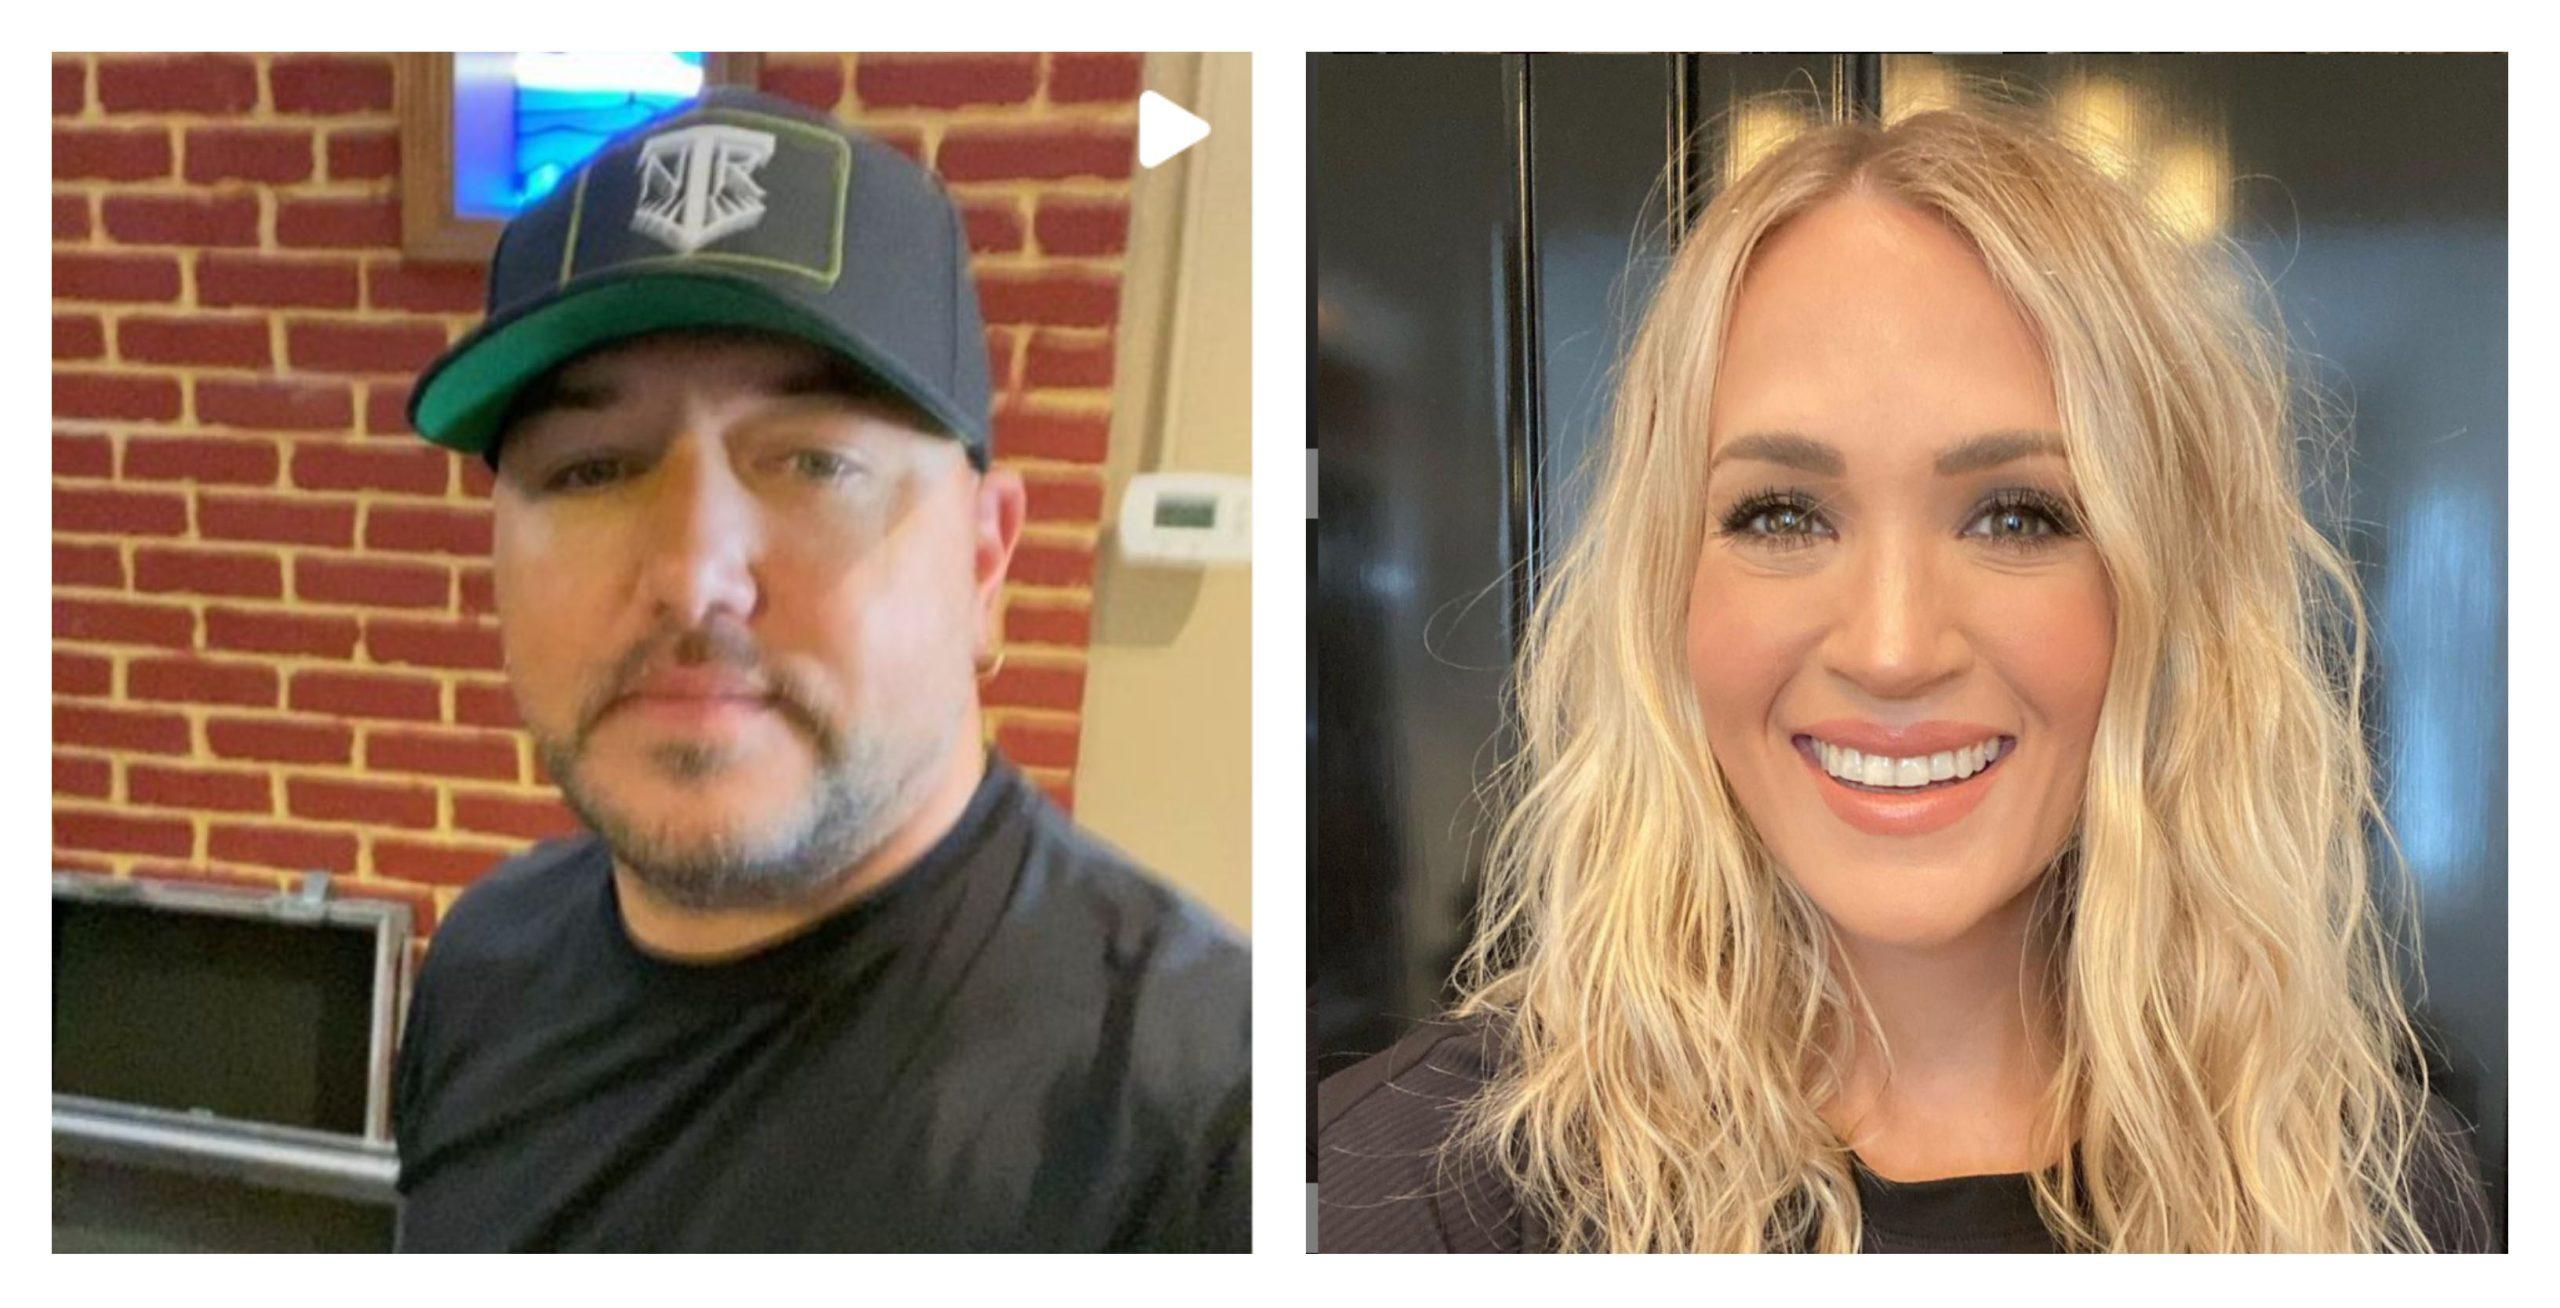 Jason Aldean Carrie Underwood duet